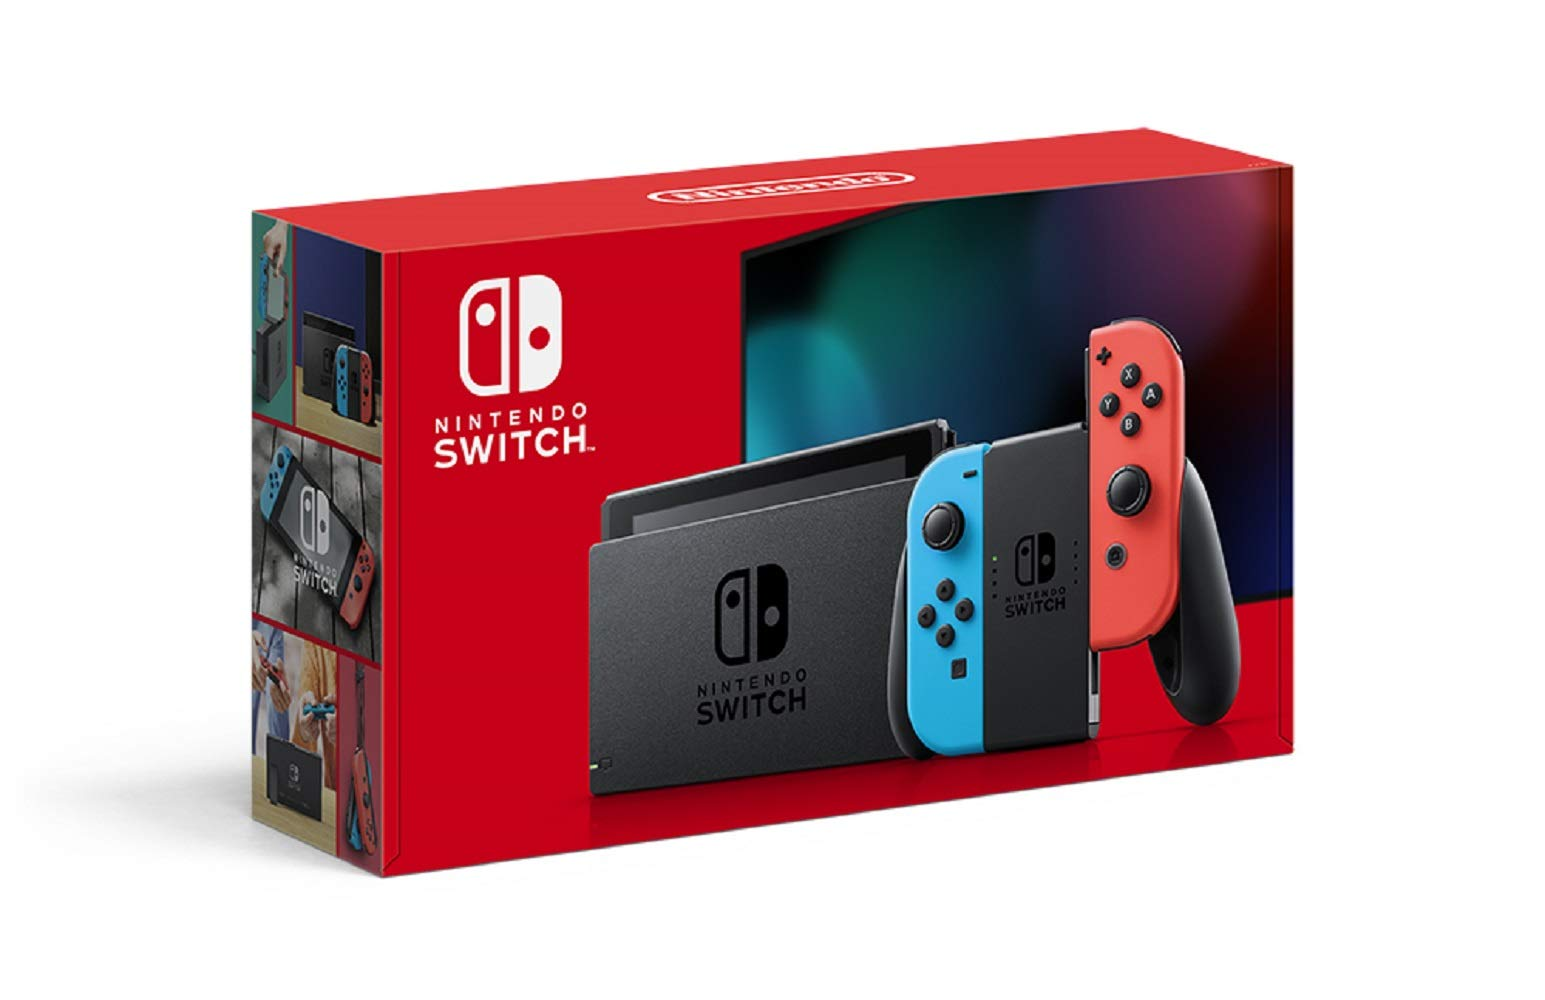 Nintendo Switch 本体、Lite、あつまれ どうぶつの森セット、リングフィットアドベンチャー の抽選販売【ひかりTVショッピング】